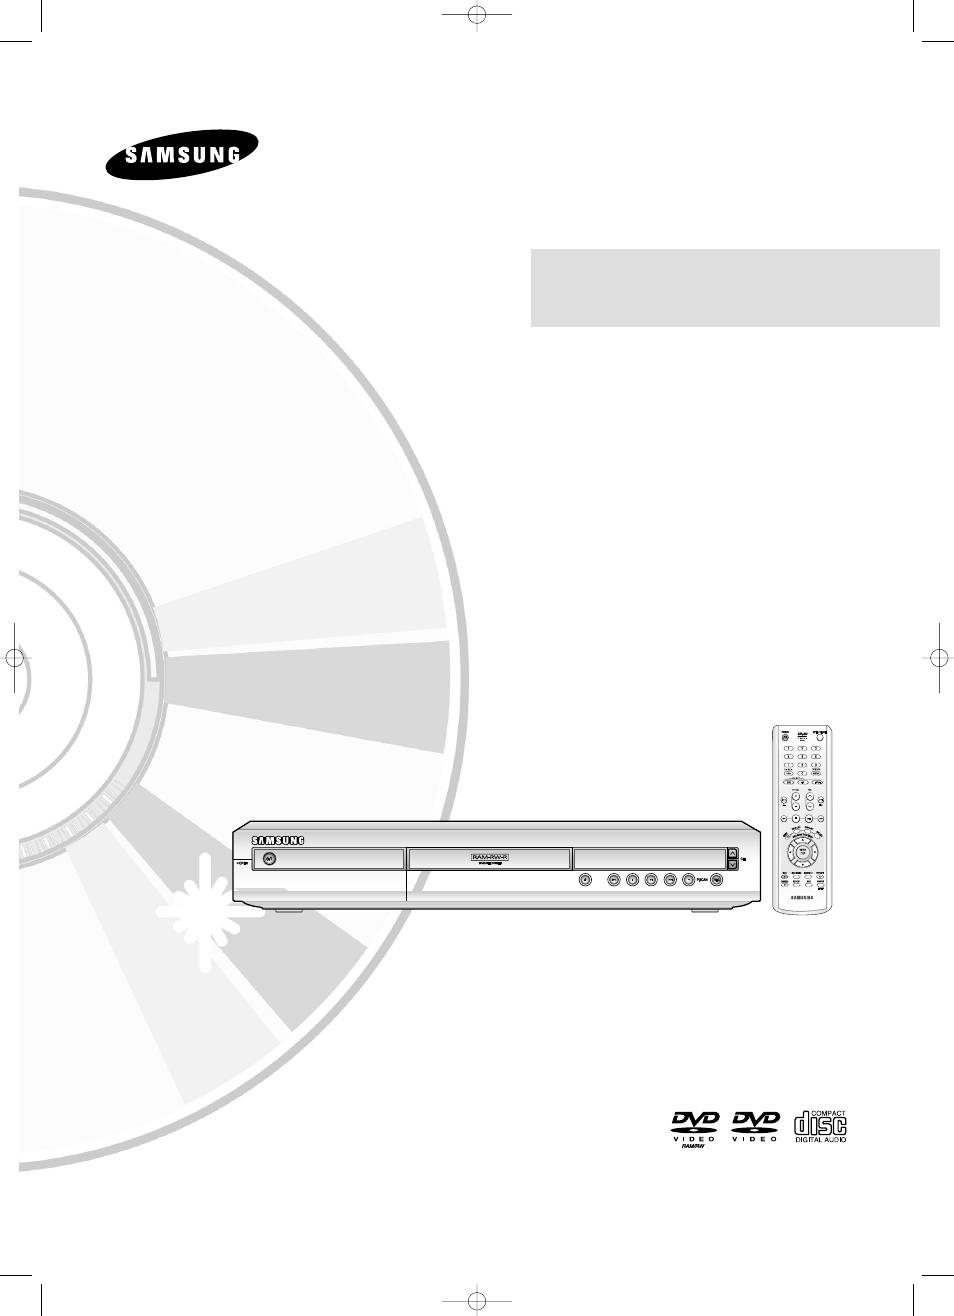 Samsung dvd recorder r120 manual.